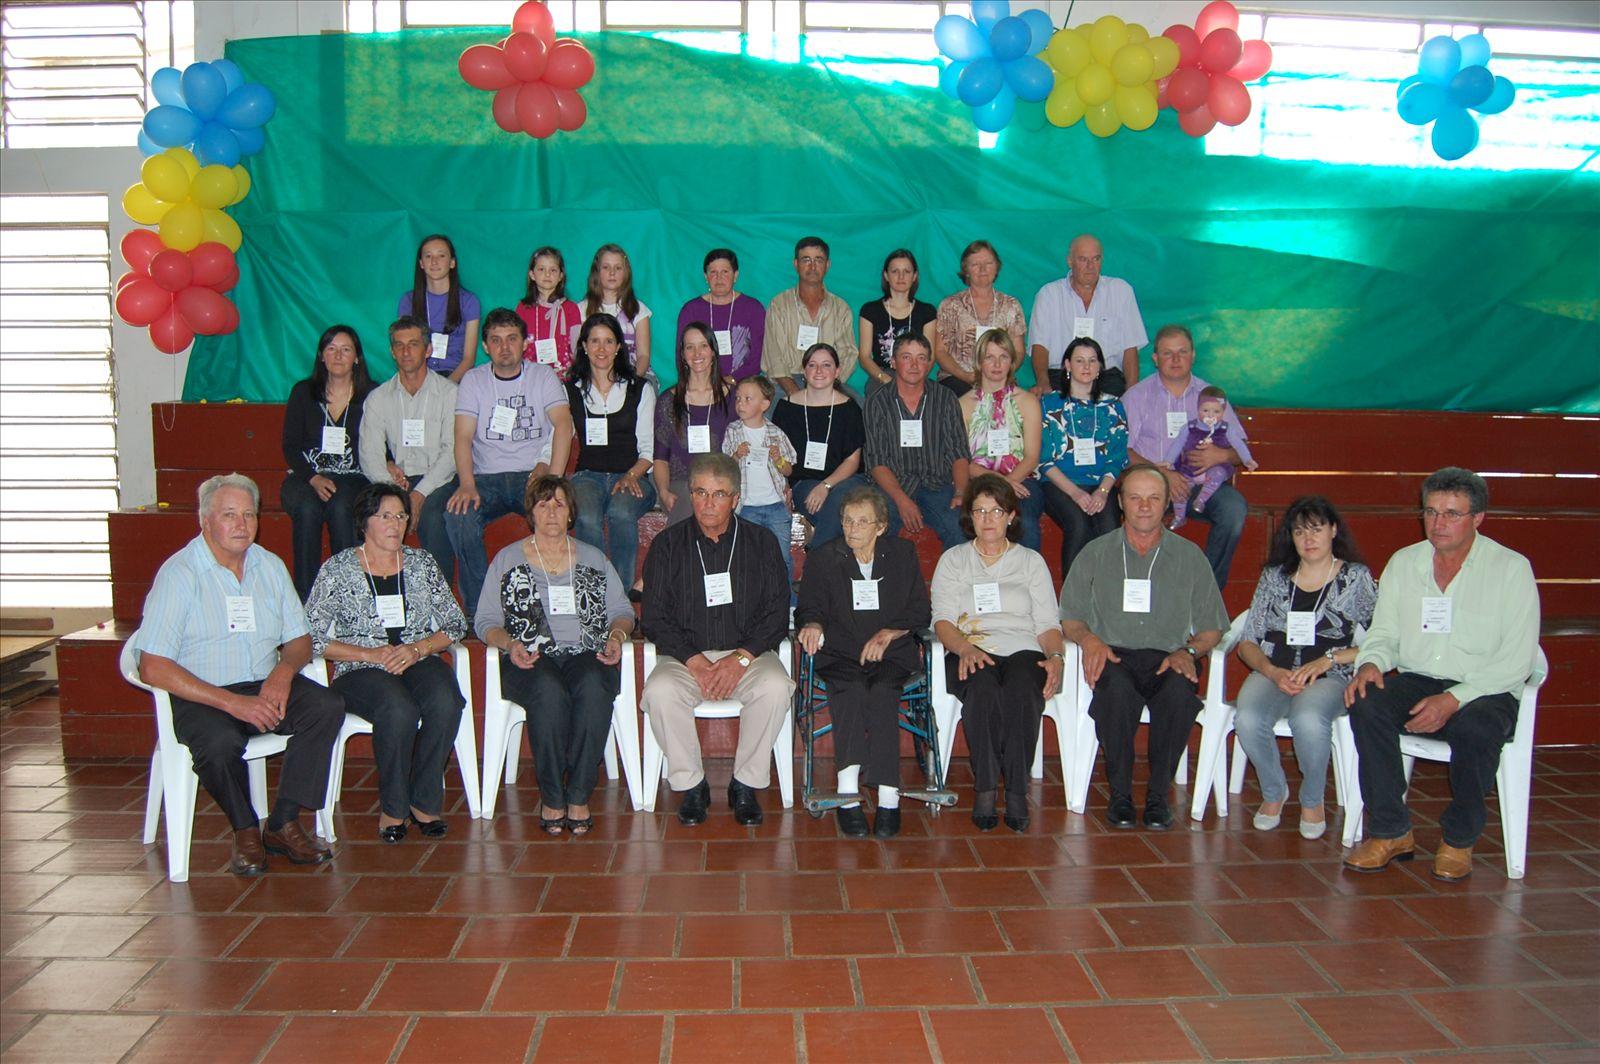 2º Encontro Família Cornelli - 11.10.2009 (172)_0